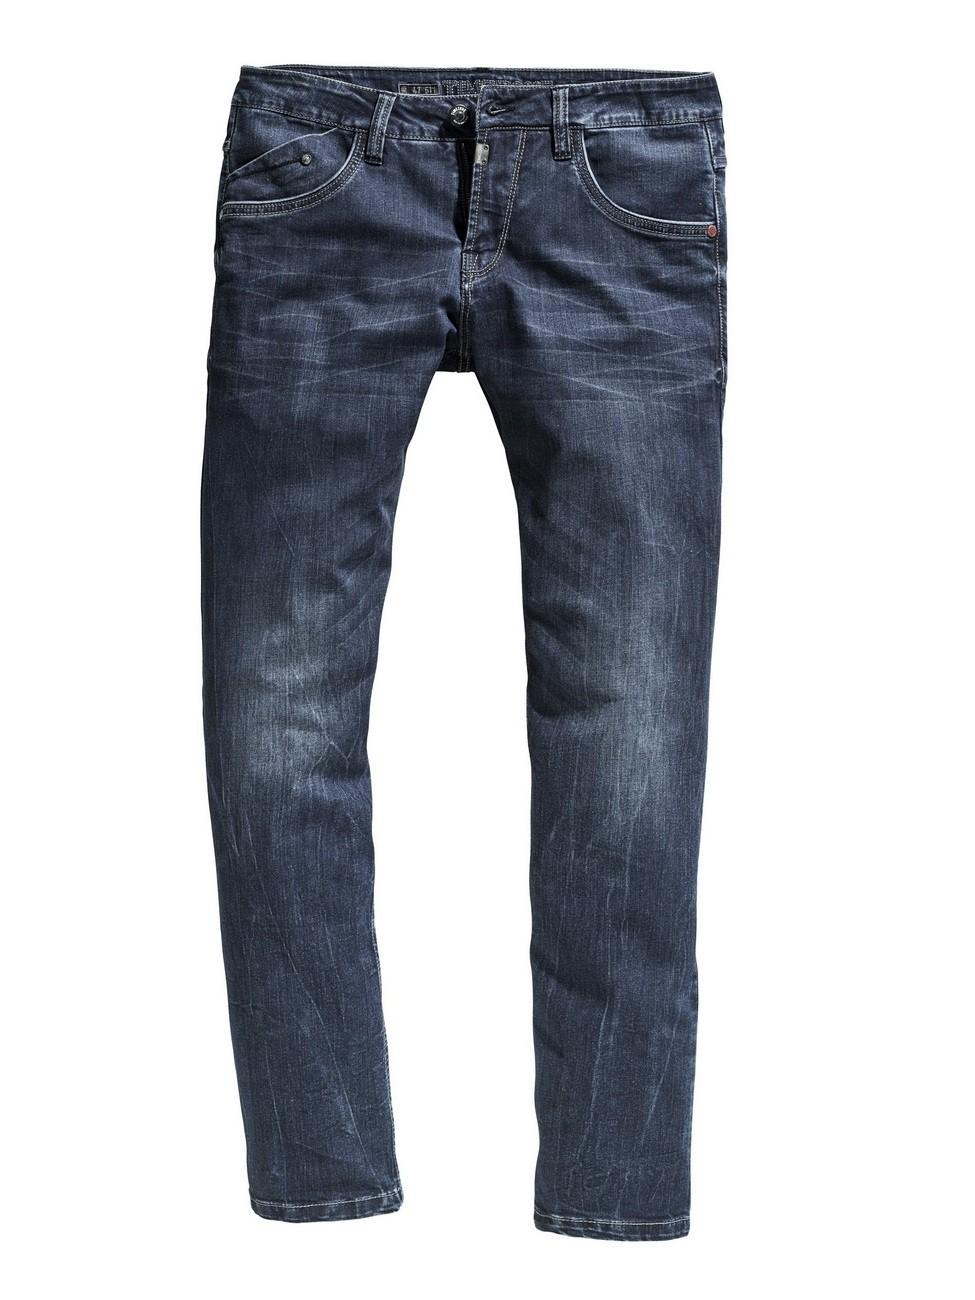 timezone herren jeans jasontz regular fit blau raywash ebay. Black Bedroom Furniture Sets. Home Design Ideas